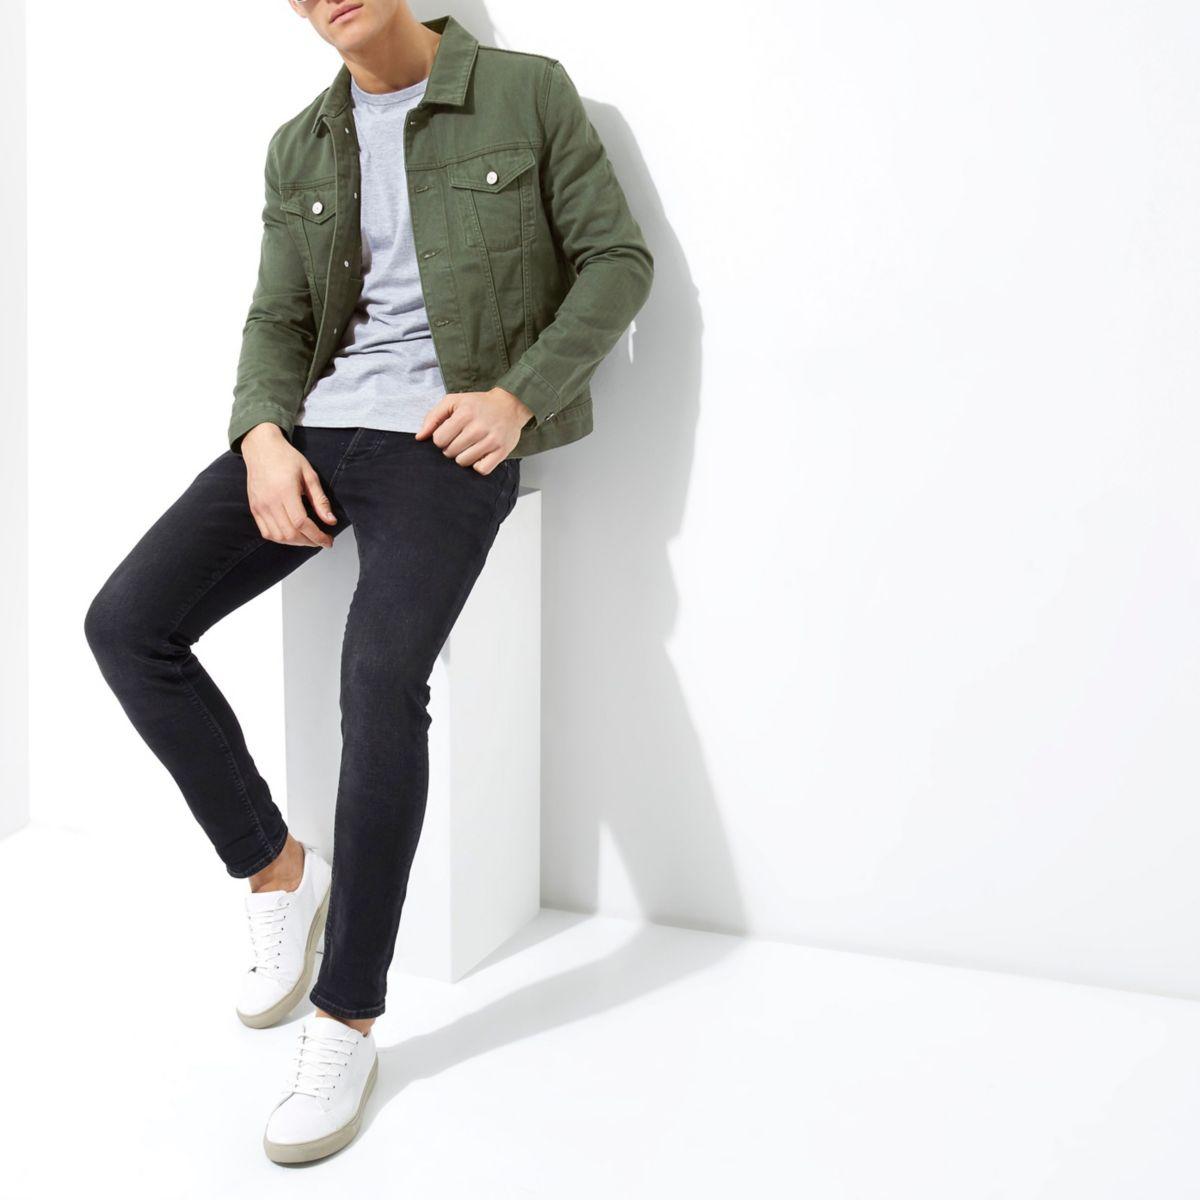 Dark green denim jacket - Jackets - Coats & Jackets - men